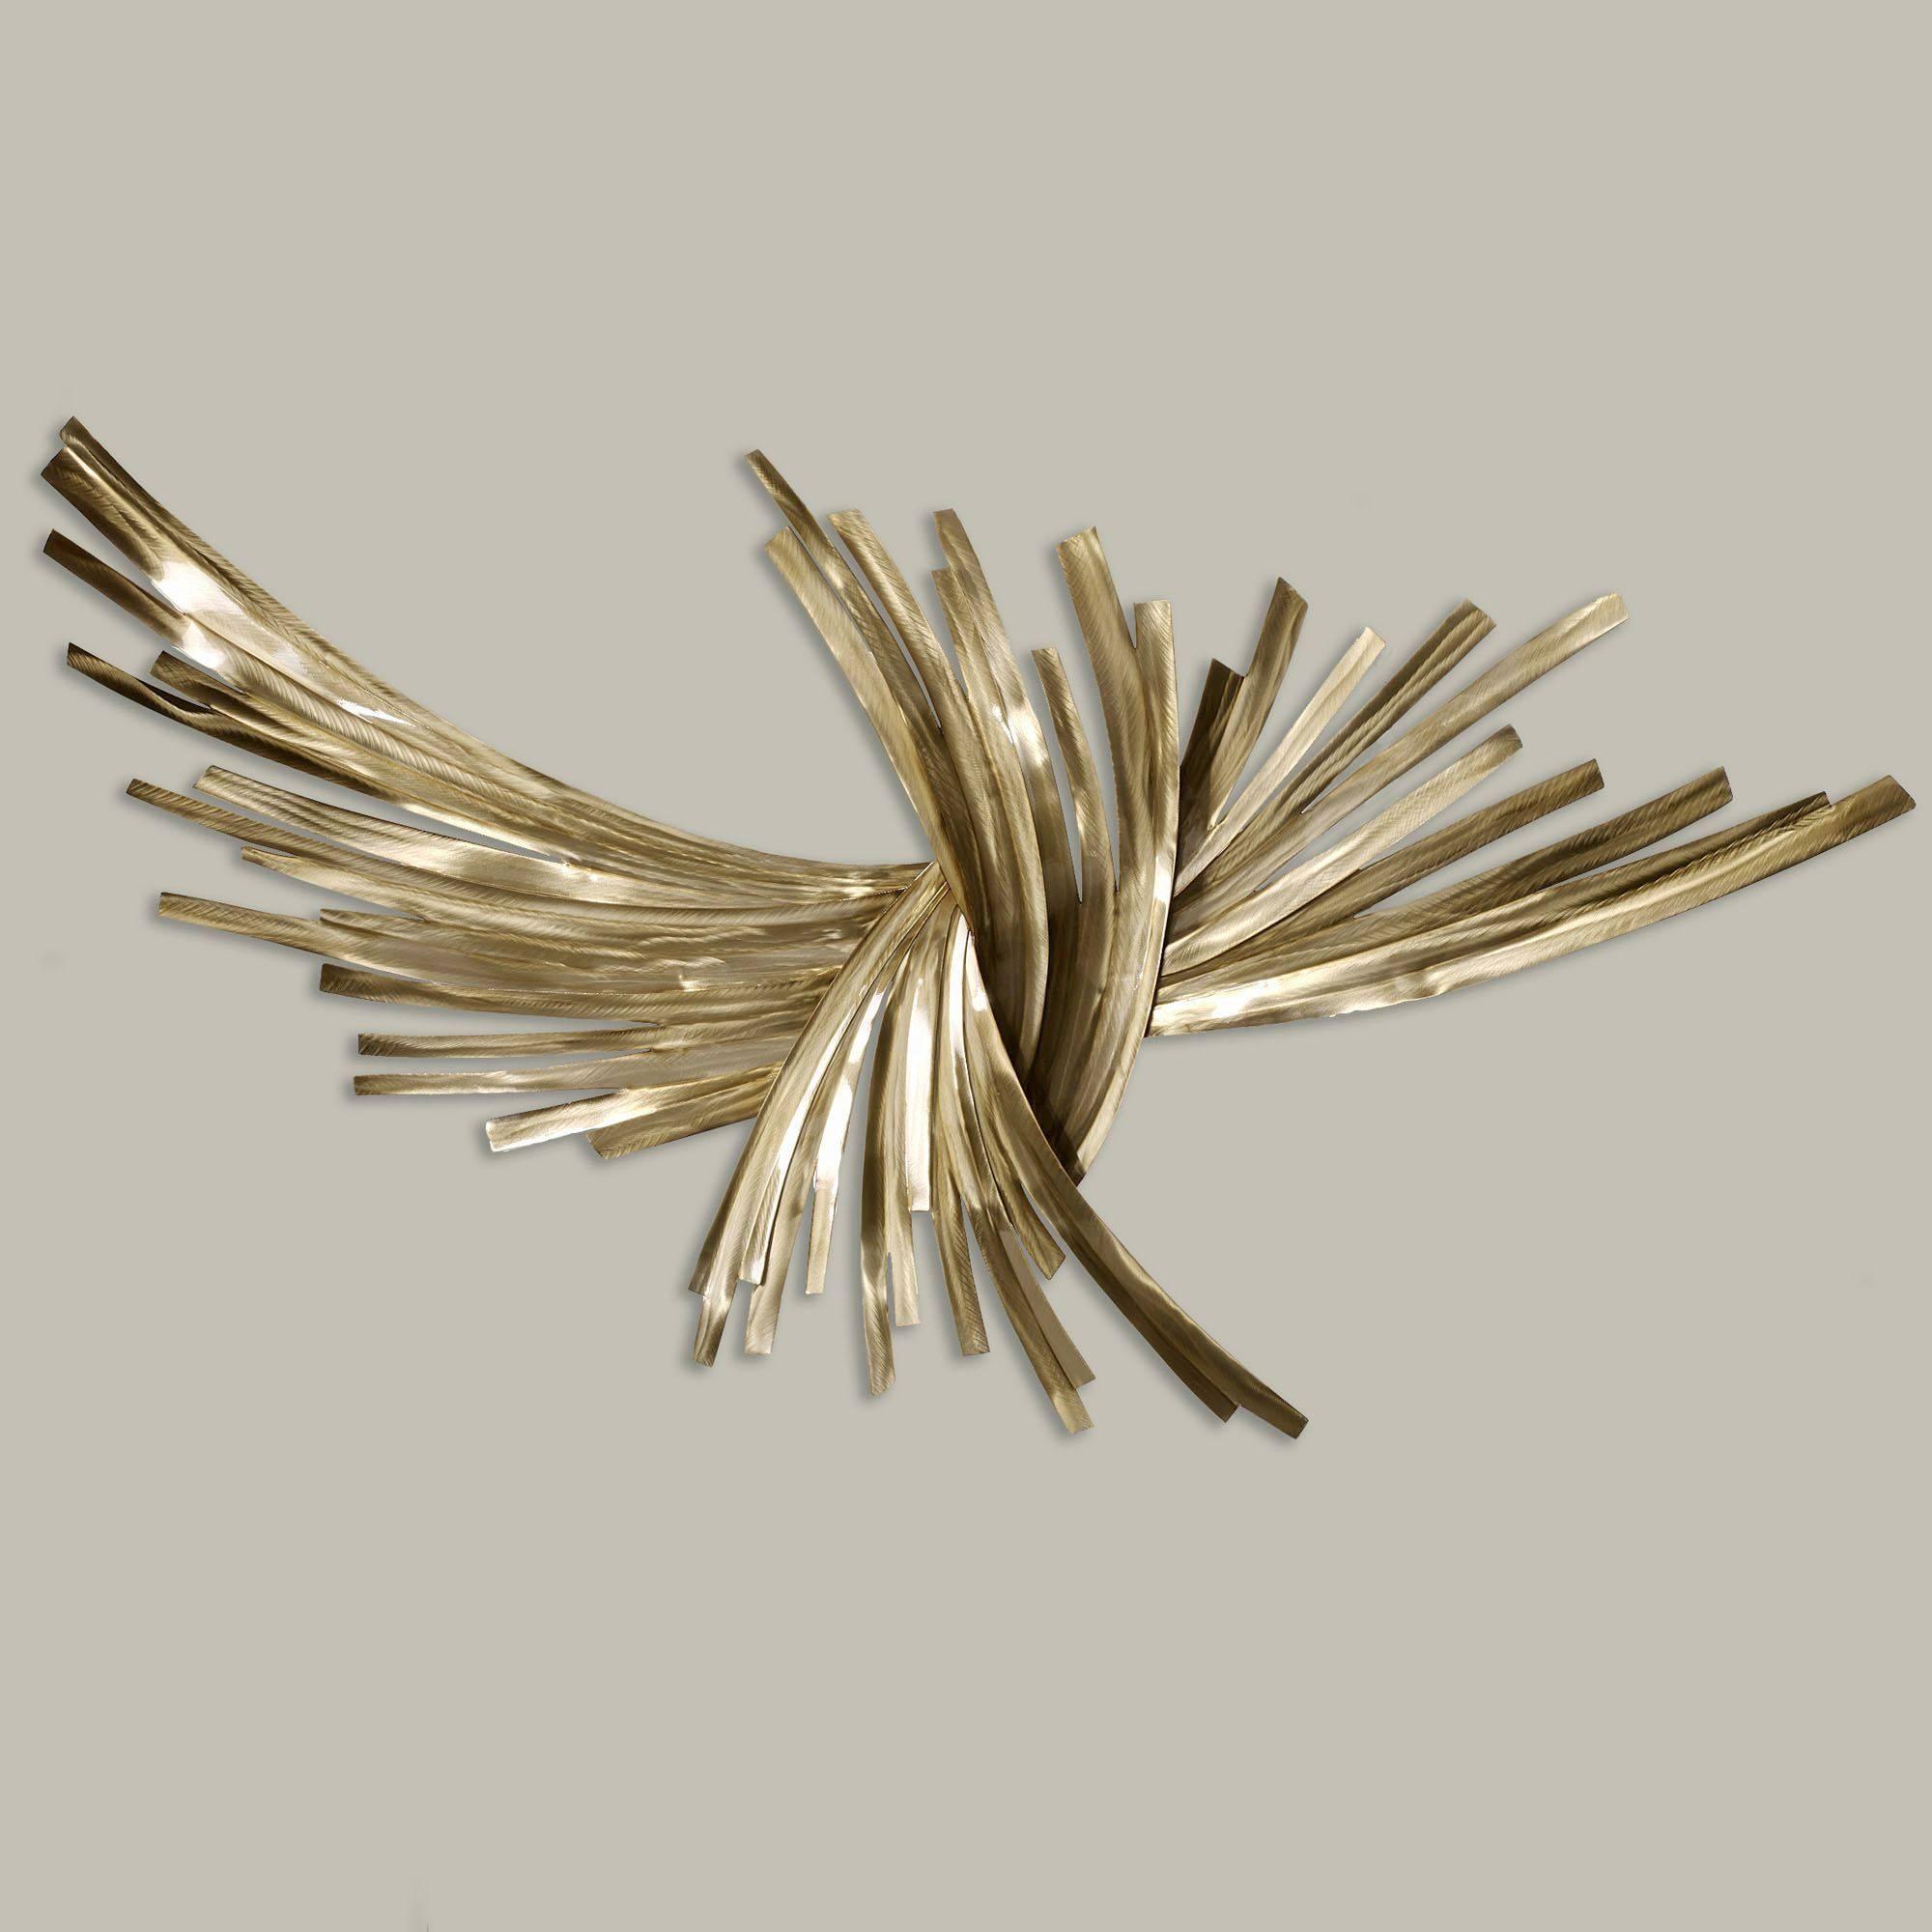 Contemporary Metal Wall Art Sculptures | Touch Of Class Regarding Recent Jeweled Metal Wall Art (View 6 of 20)